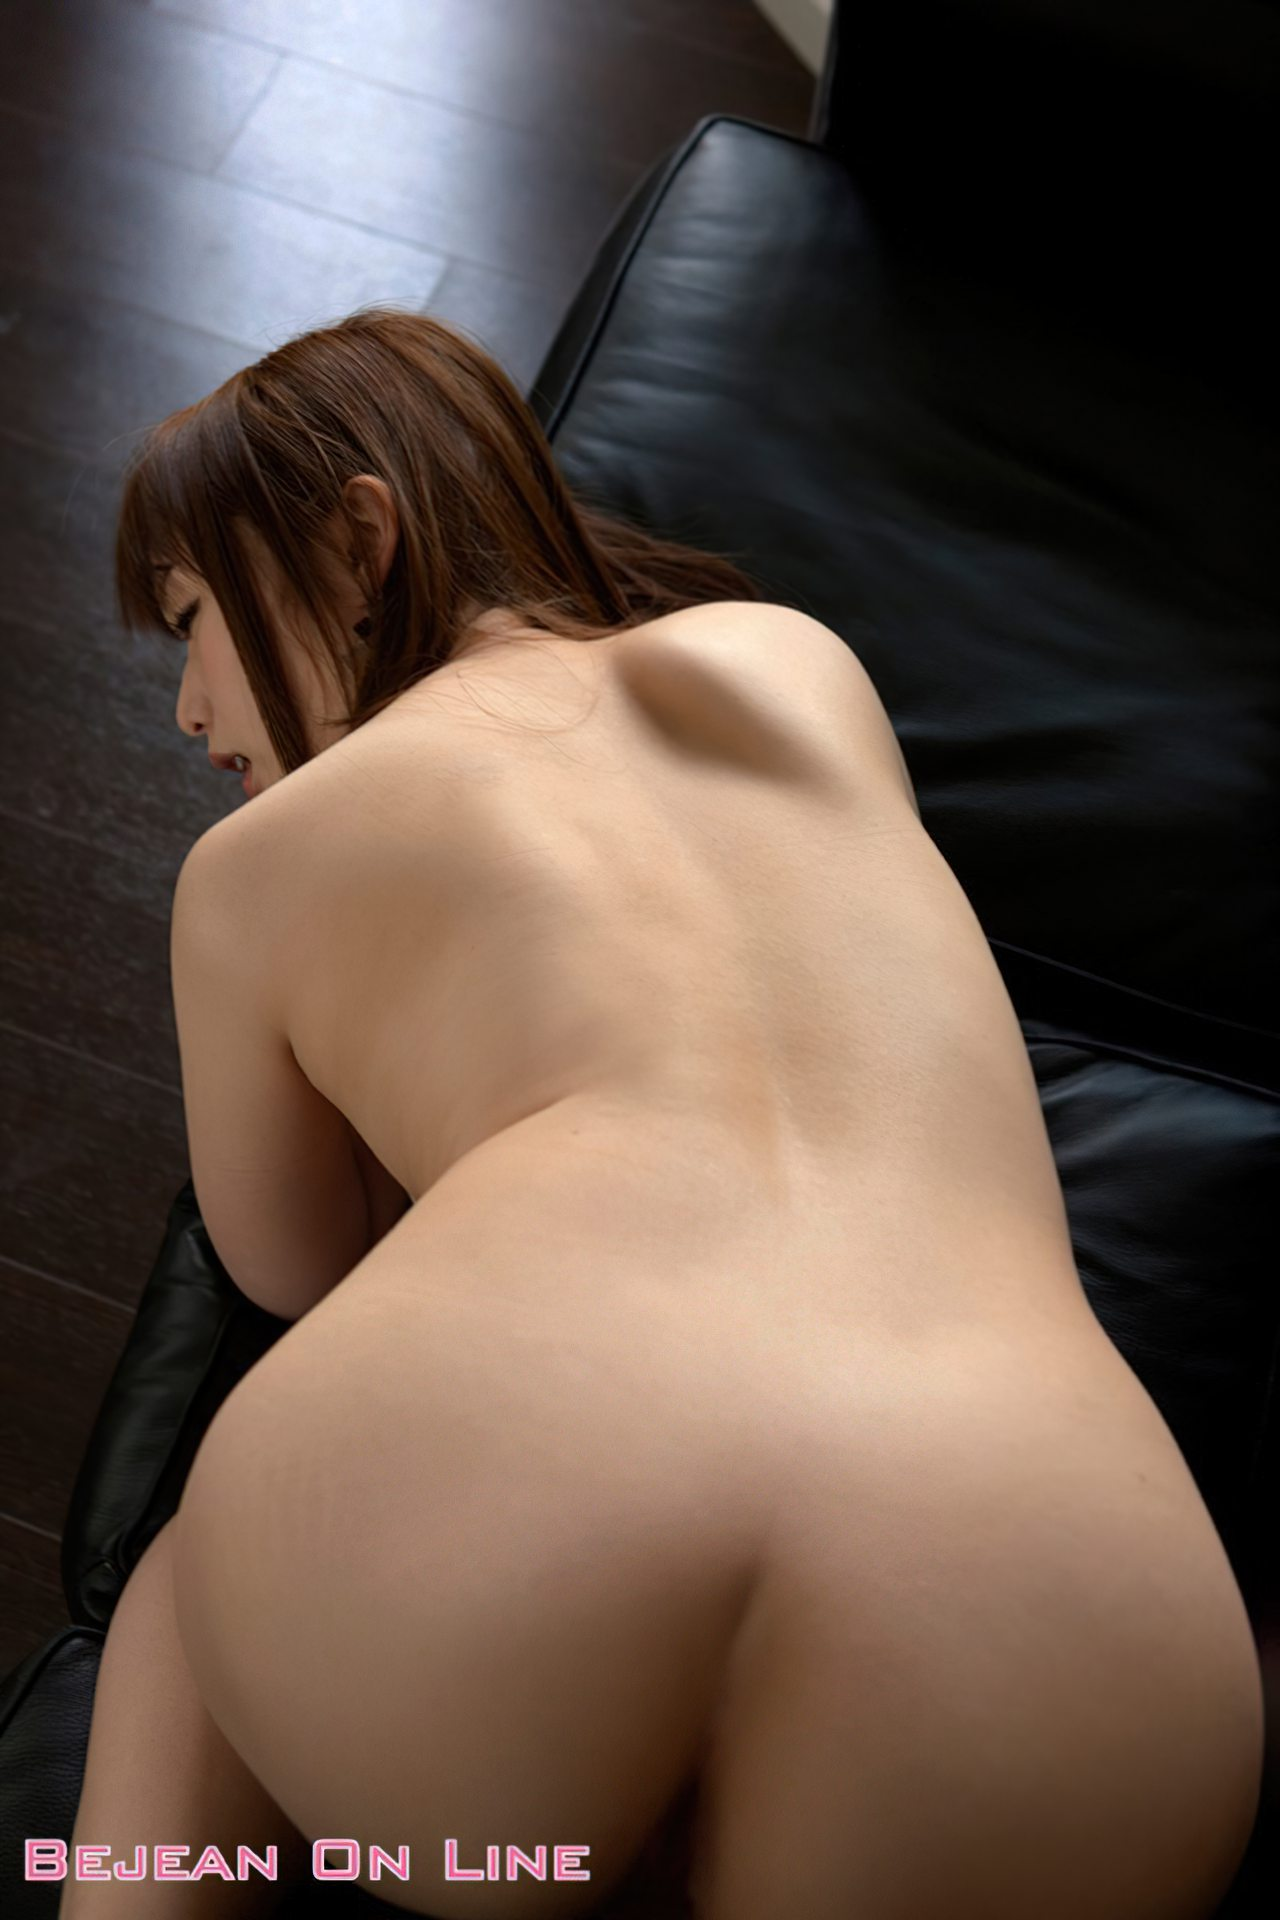 Japonesa Safada (19)